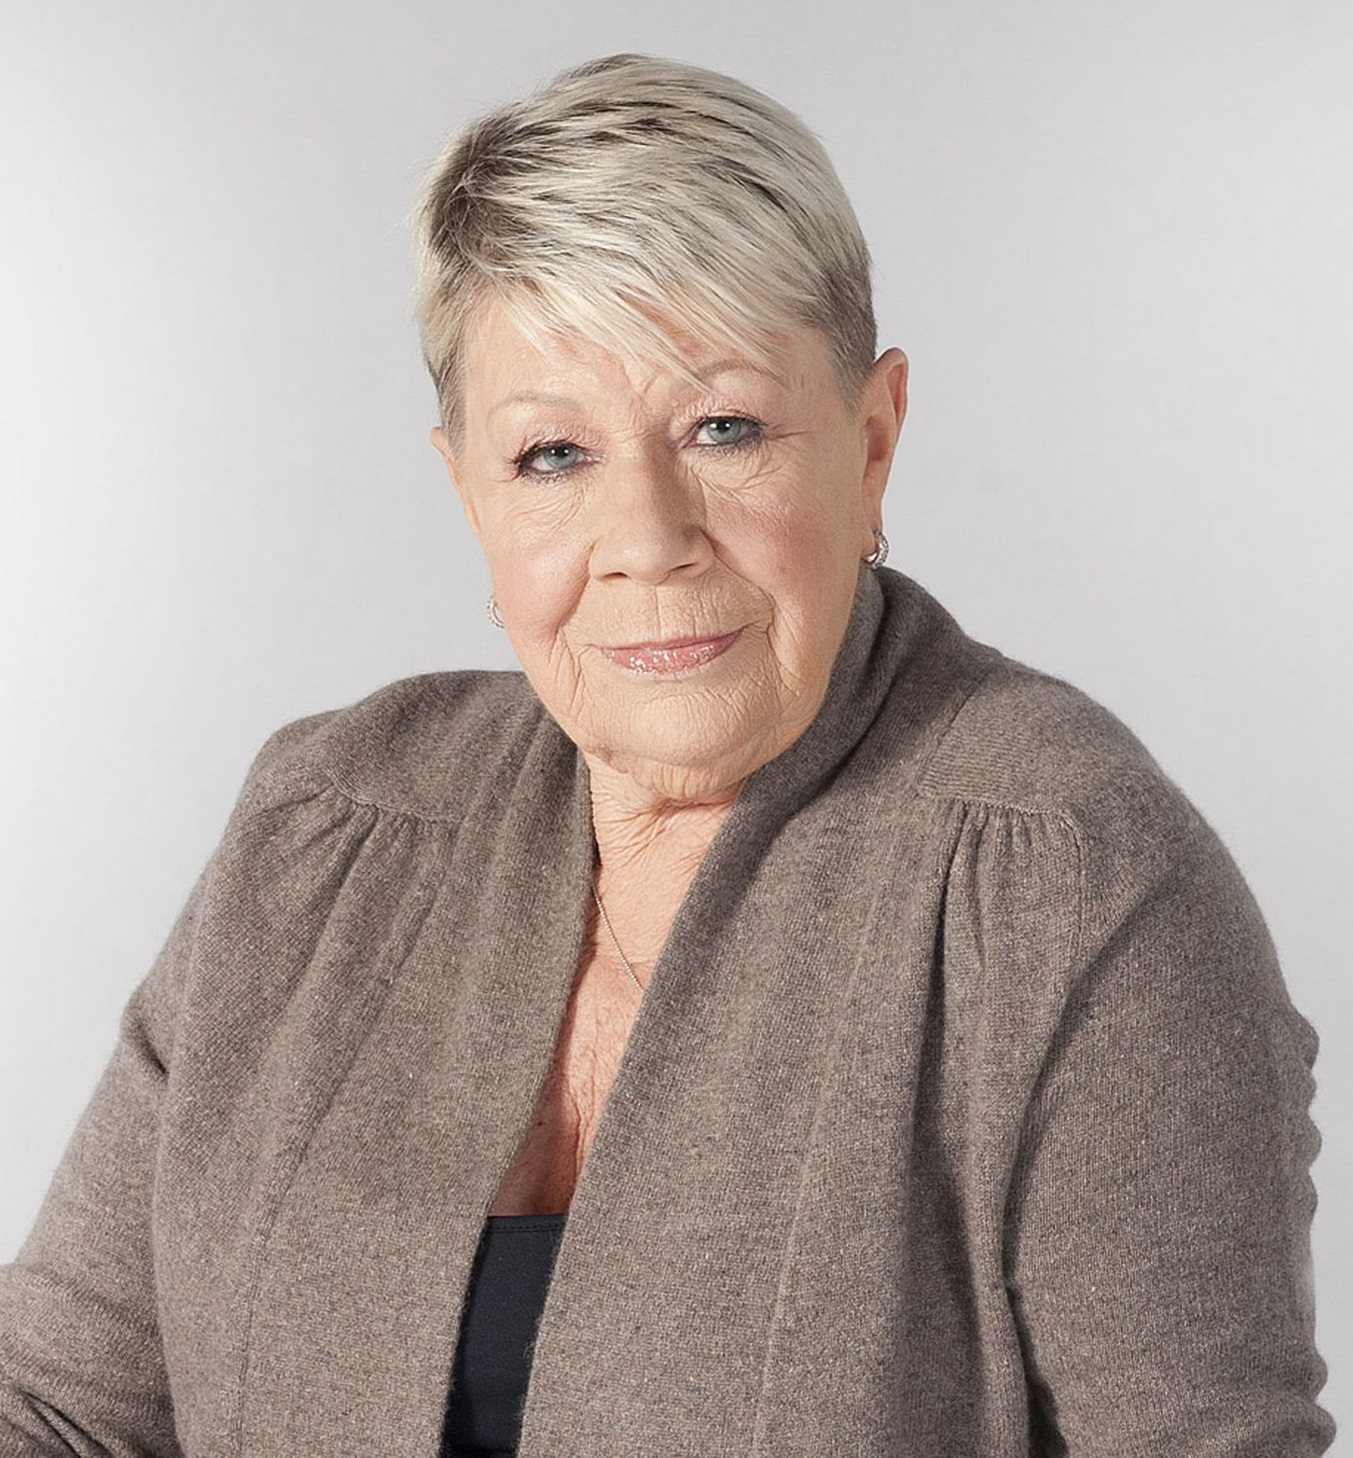 Rose Jackson (actress),Valerie Harper born August 22, 1939 (age 79) Hot picture Paddy Croft,Talita von Furstenberg